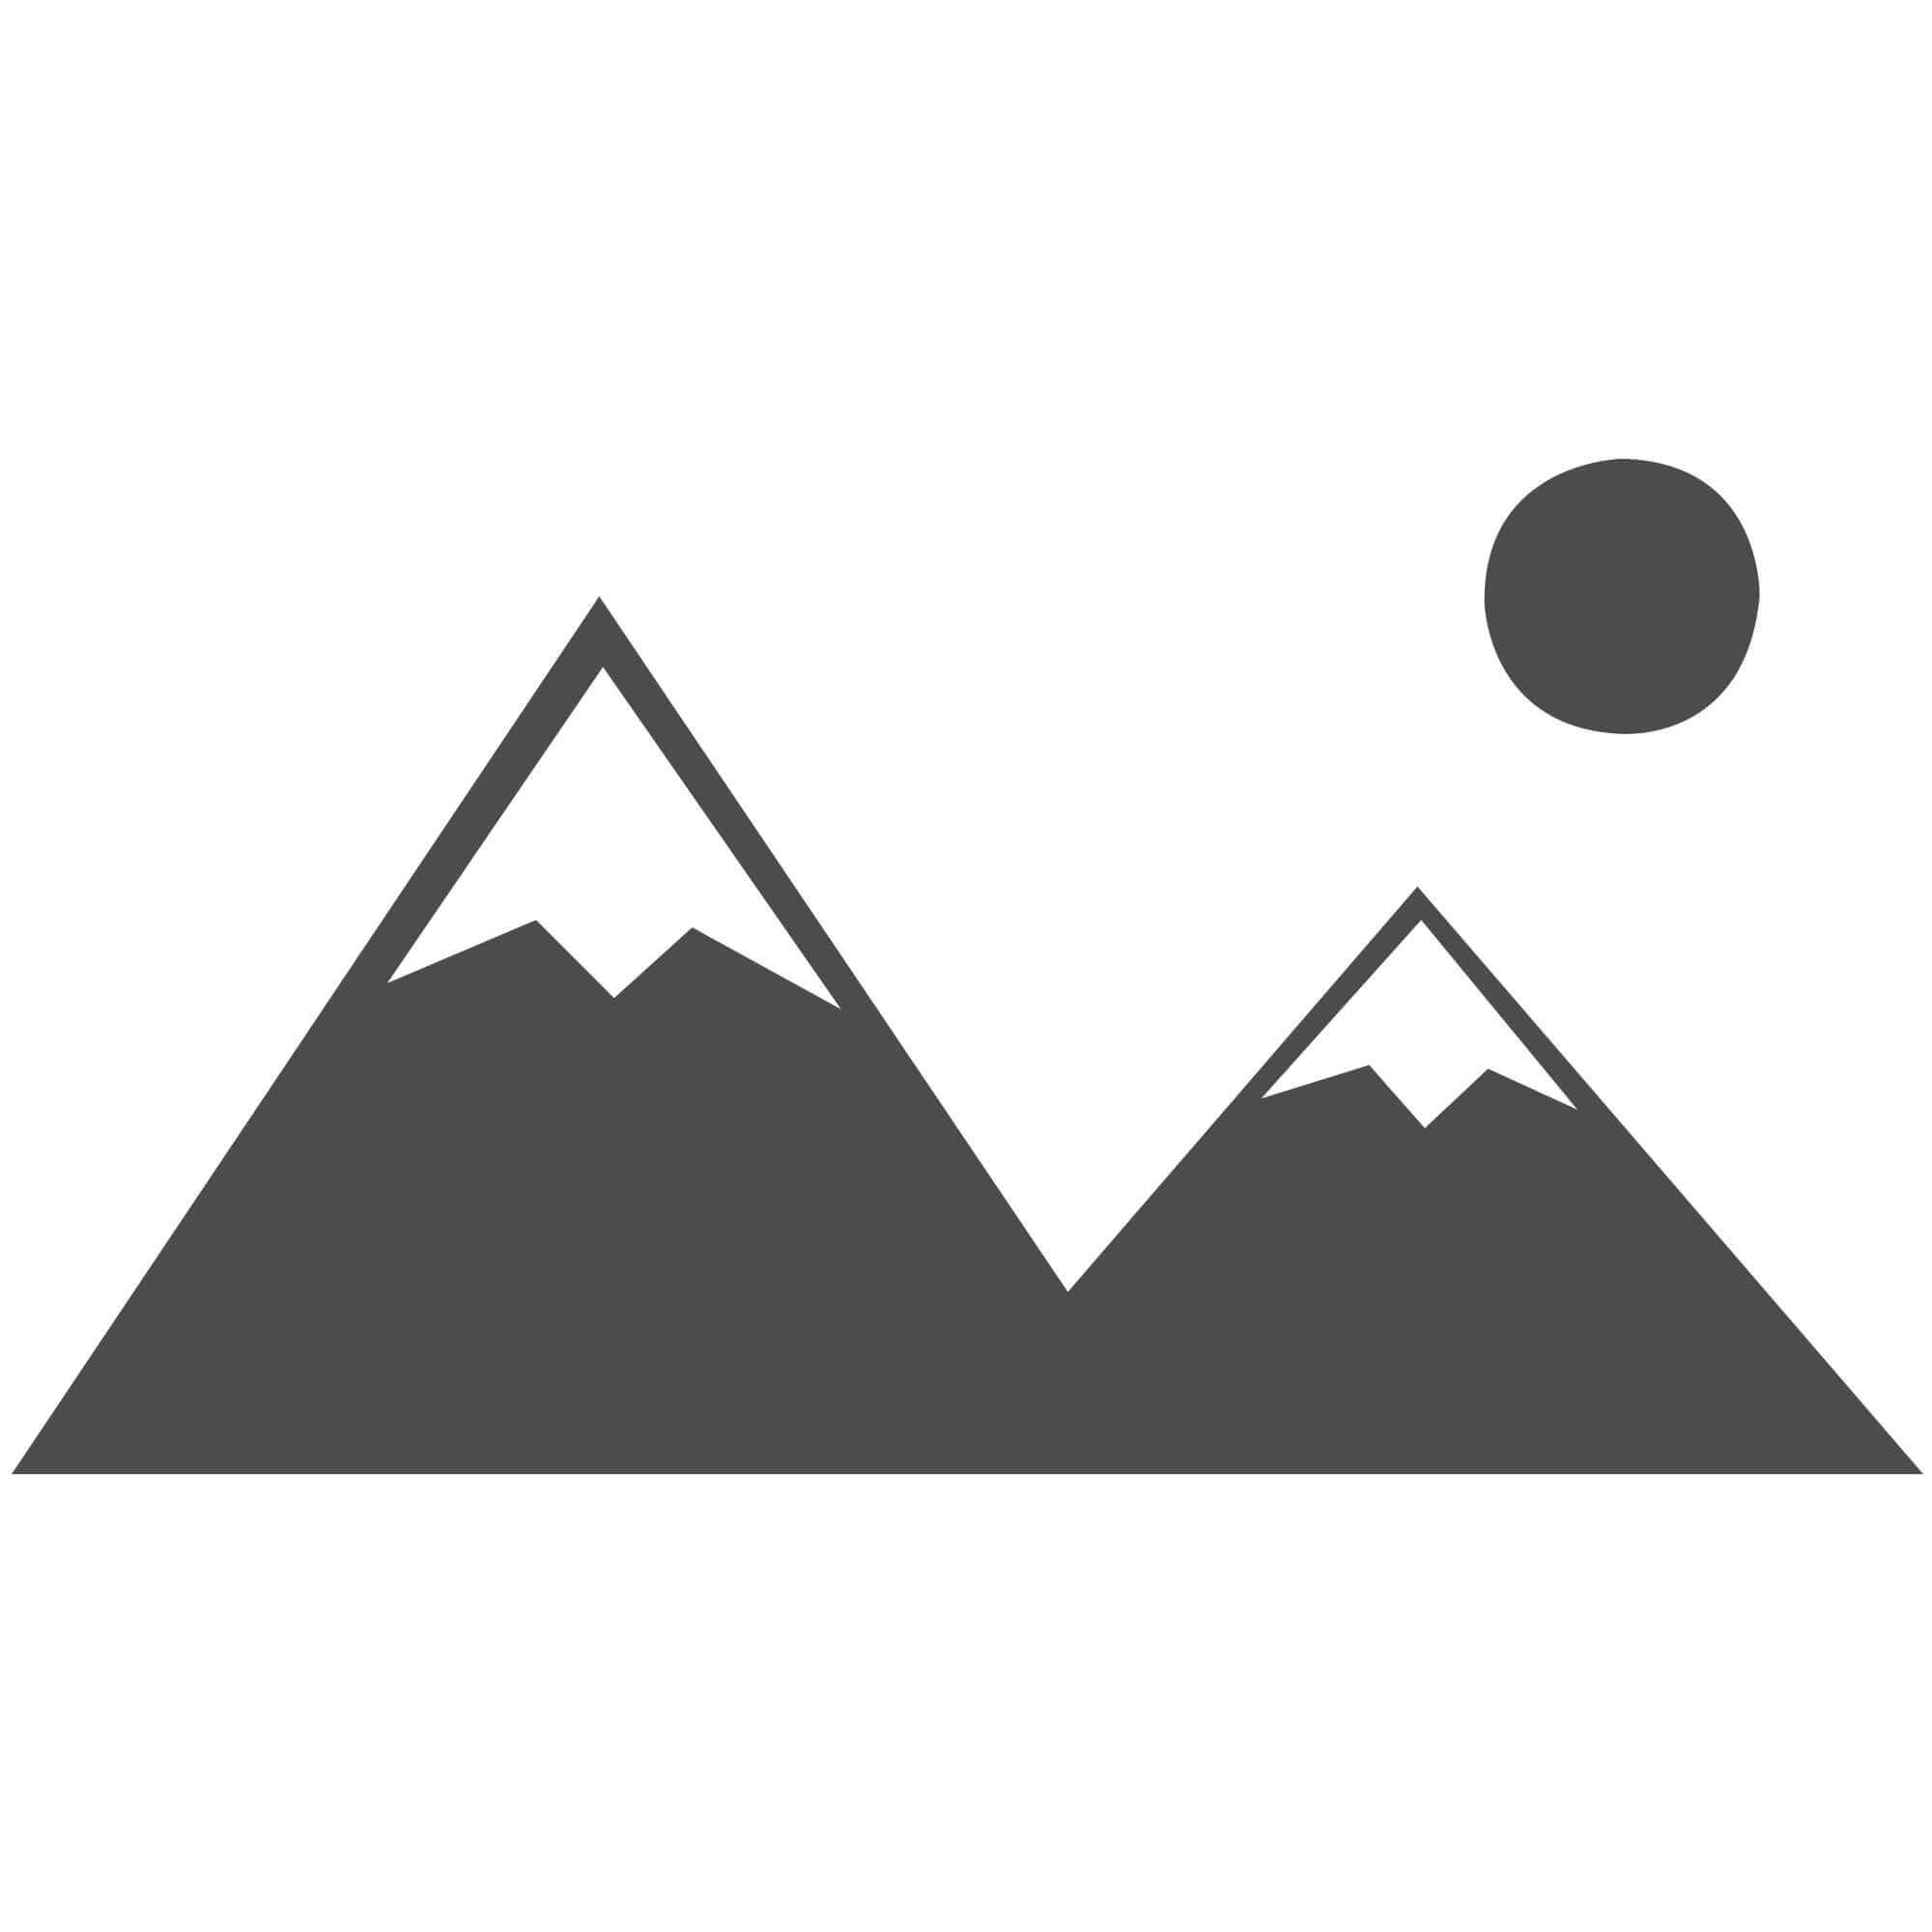 Alhambra Traditional Rug - 6992a rose/beige - Size Runner 67 x 230 cm